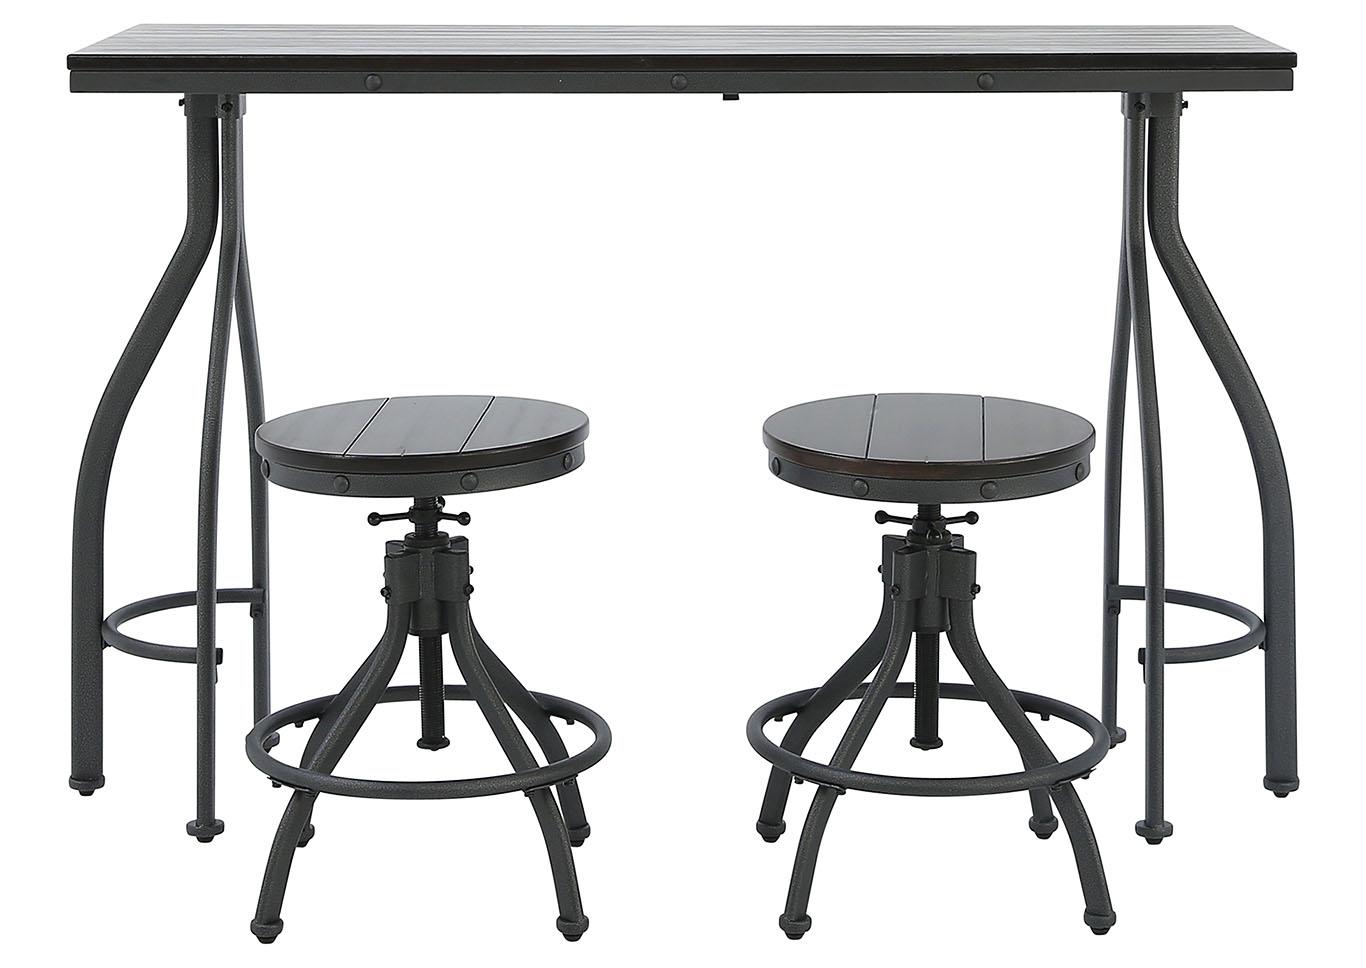 Super Ivan Smith Odium 3 Piece Pub Dining Set Andrewgaddart Wooden Chair Designs For Living Room Andrewgaddartcom